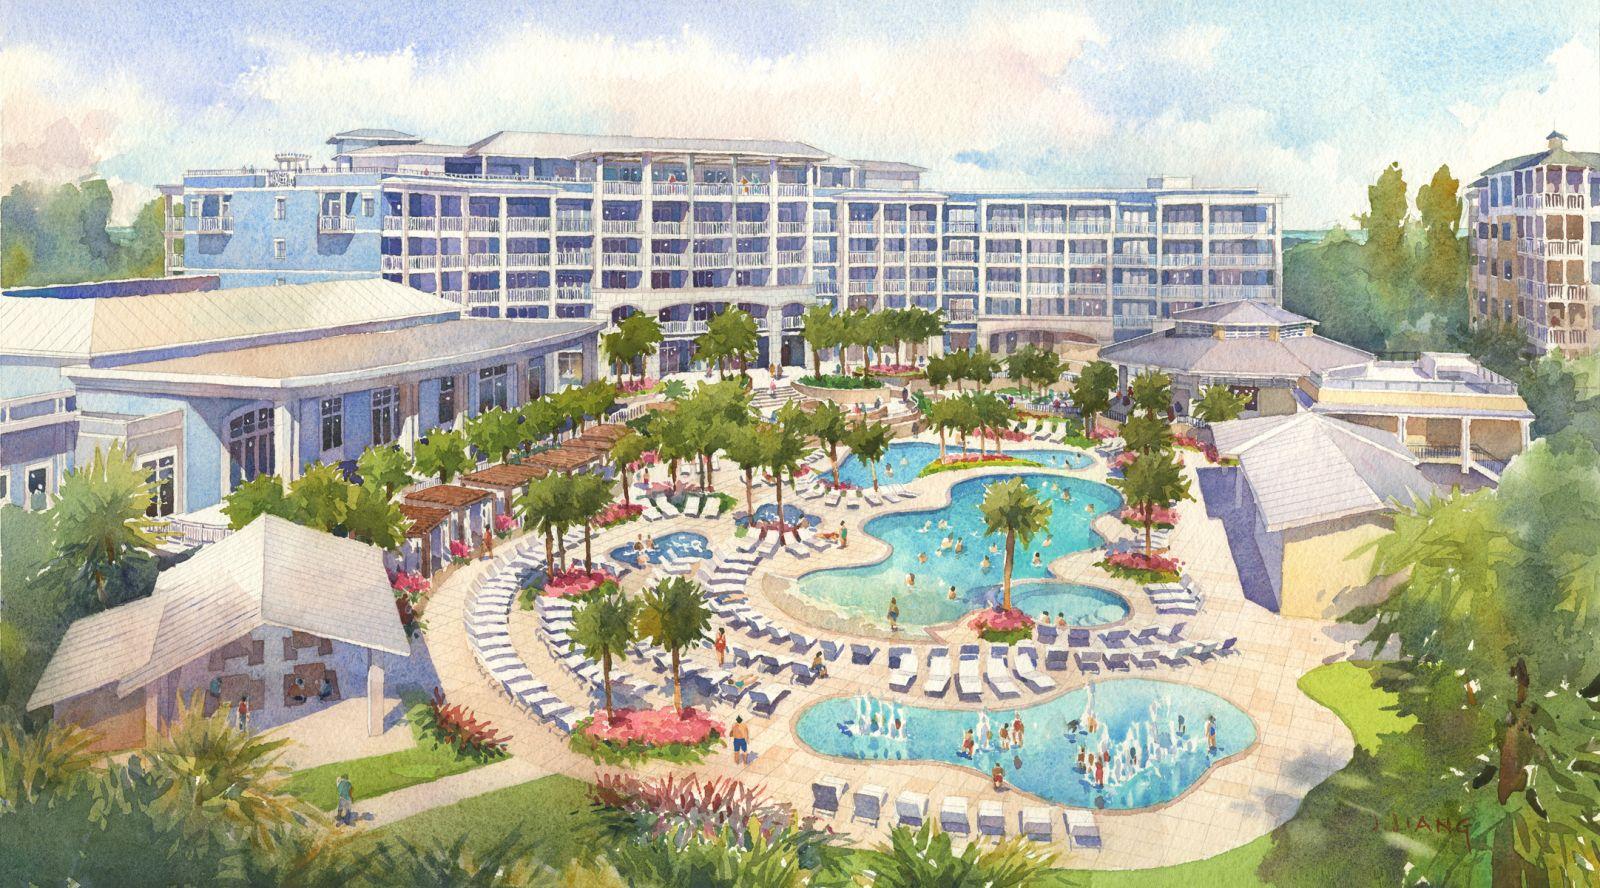 Wild Dunes Resort Plans Expansion